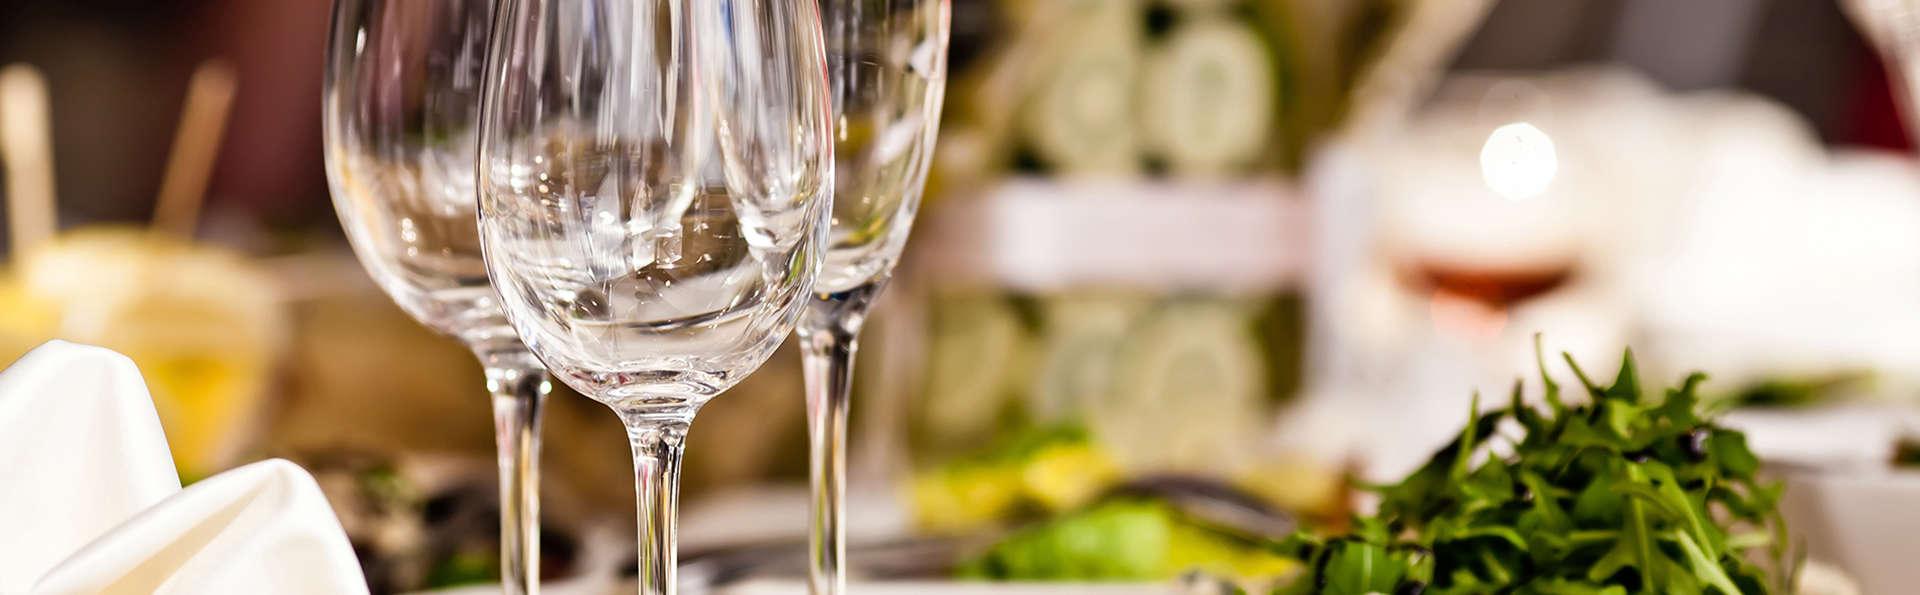 Séjour avec dîner en bord de mer à Voorne